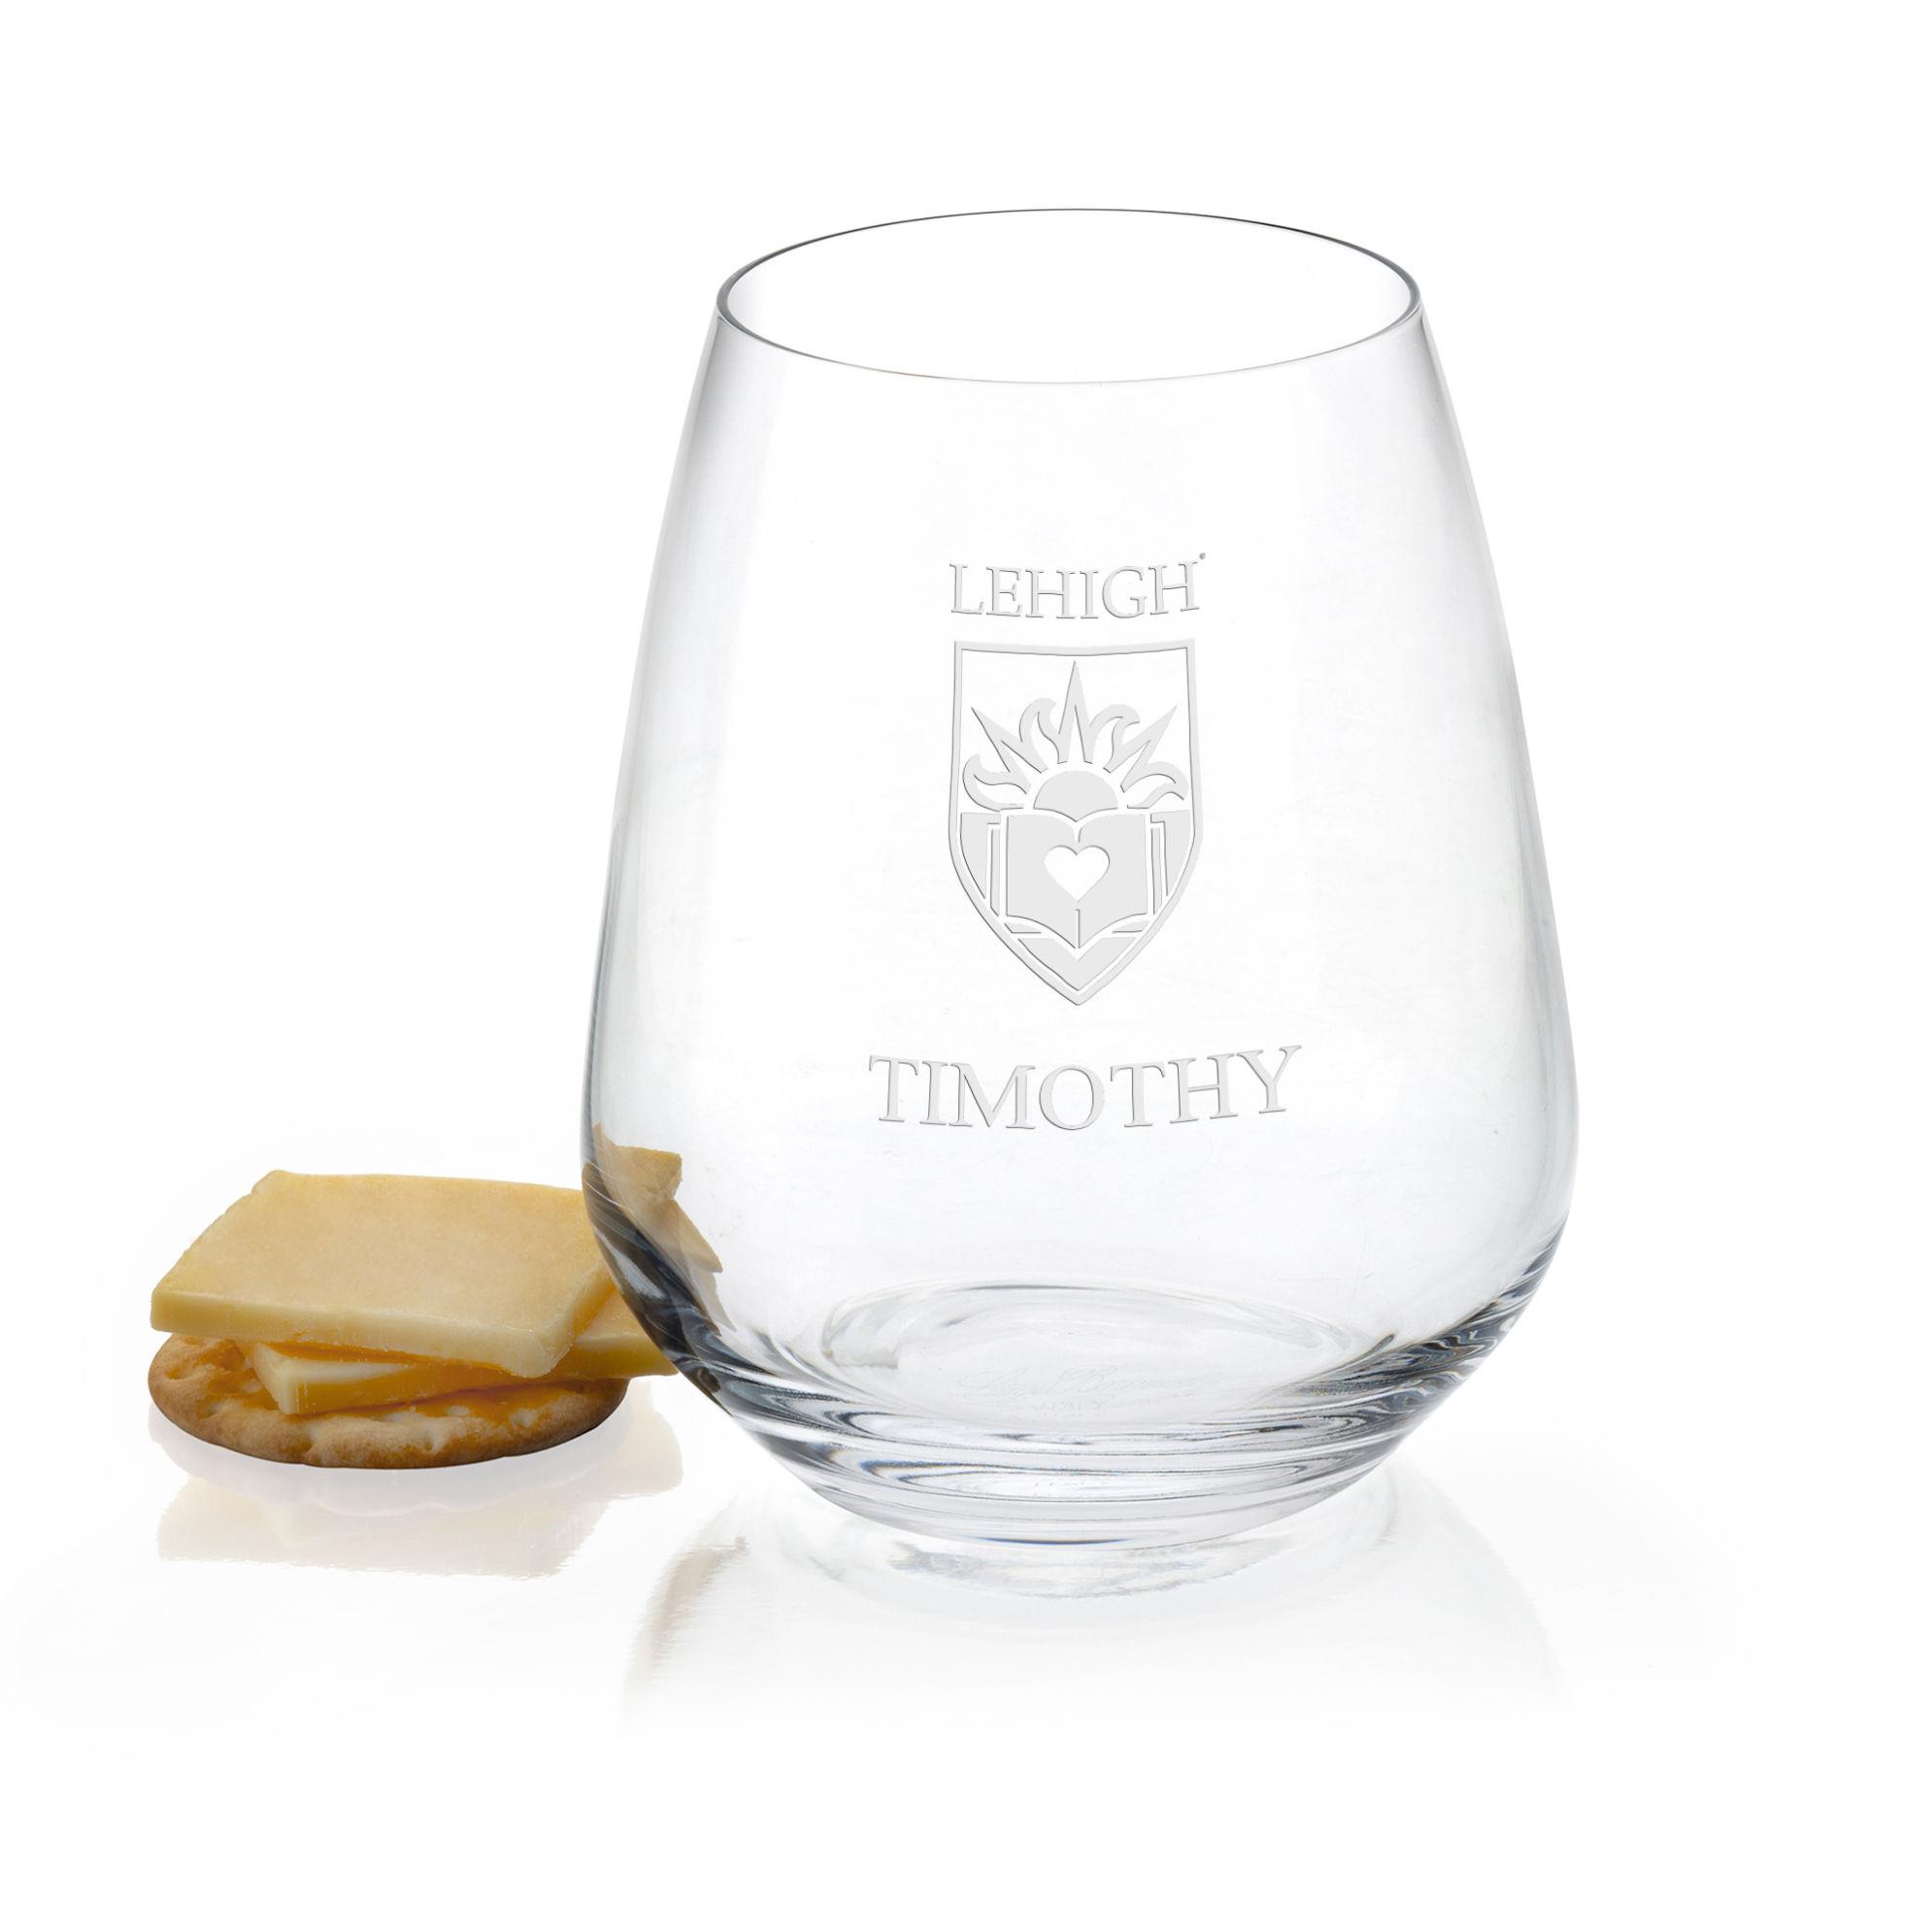 Lehigh University Stemless Wine Glasses - Set of 4